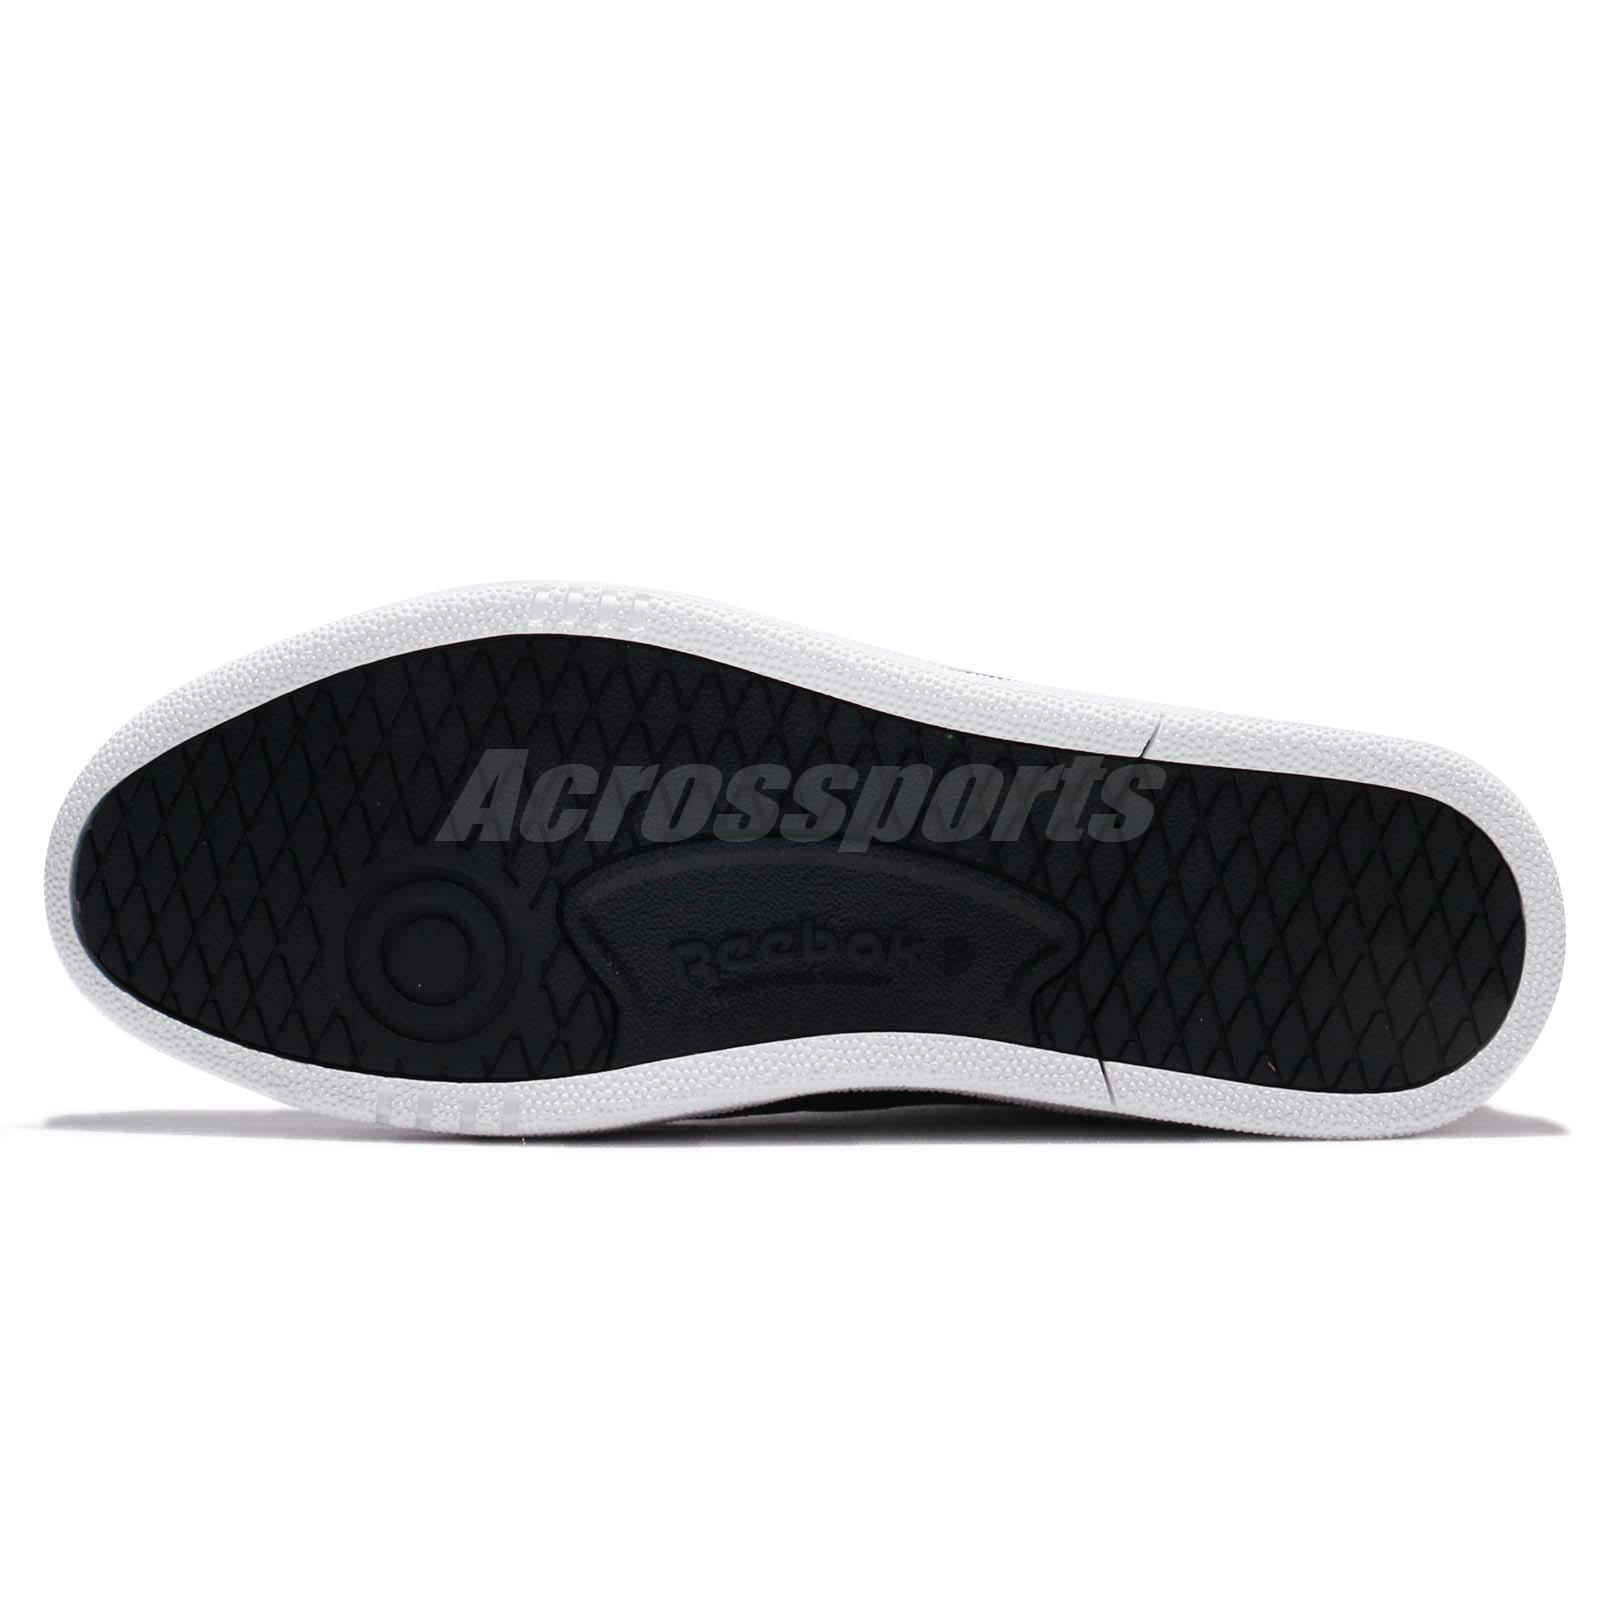 c14572d8e0fa Reebok Club C 85 Pro Black White Men Classic Shoes Sneakers Trainers ...